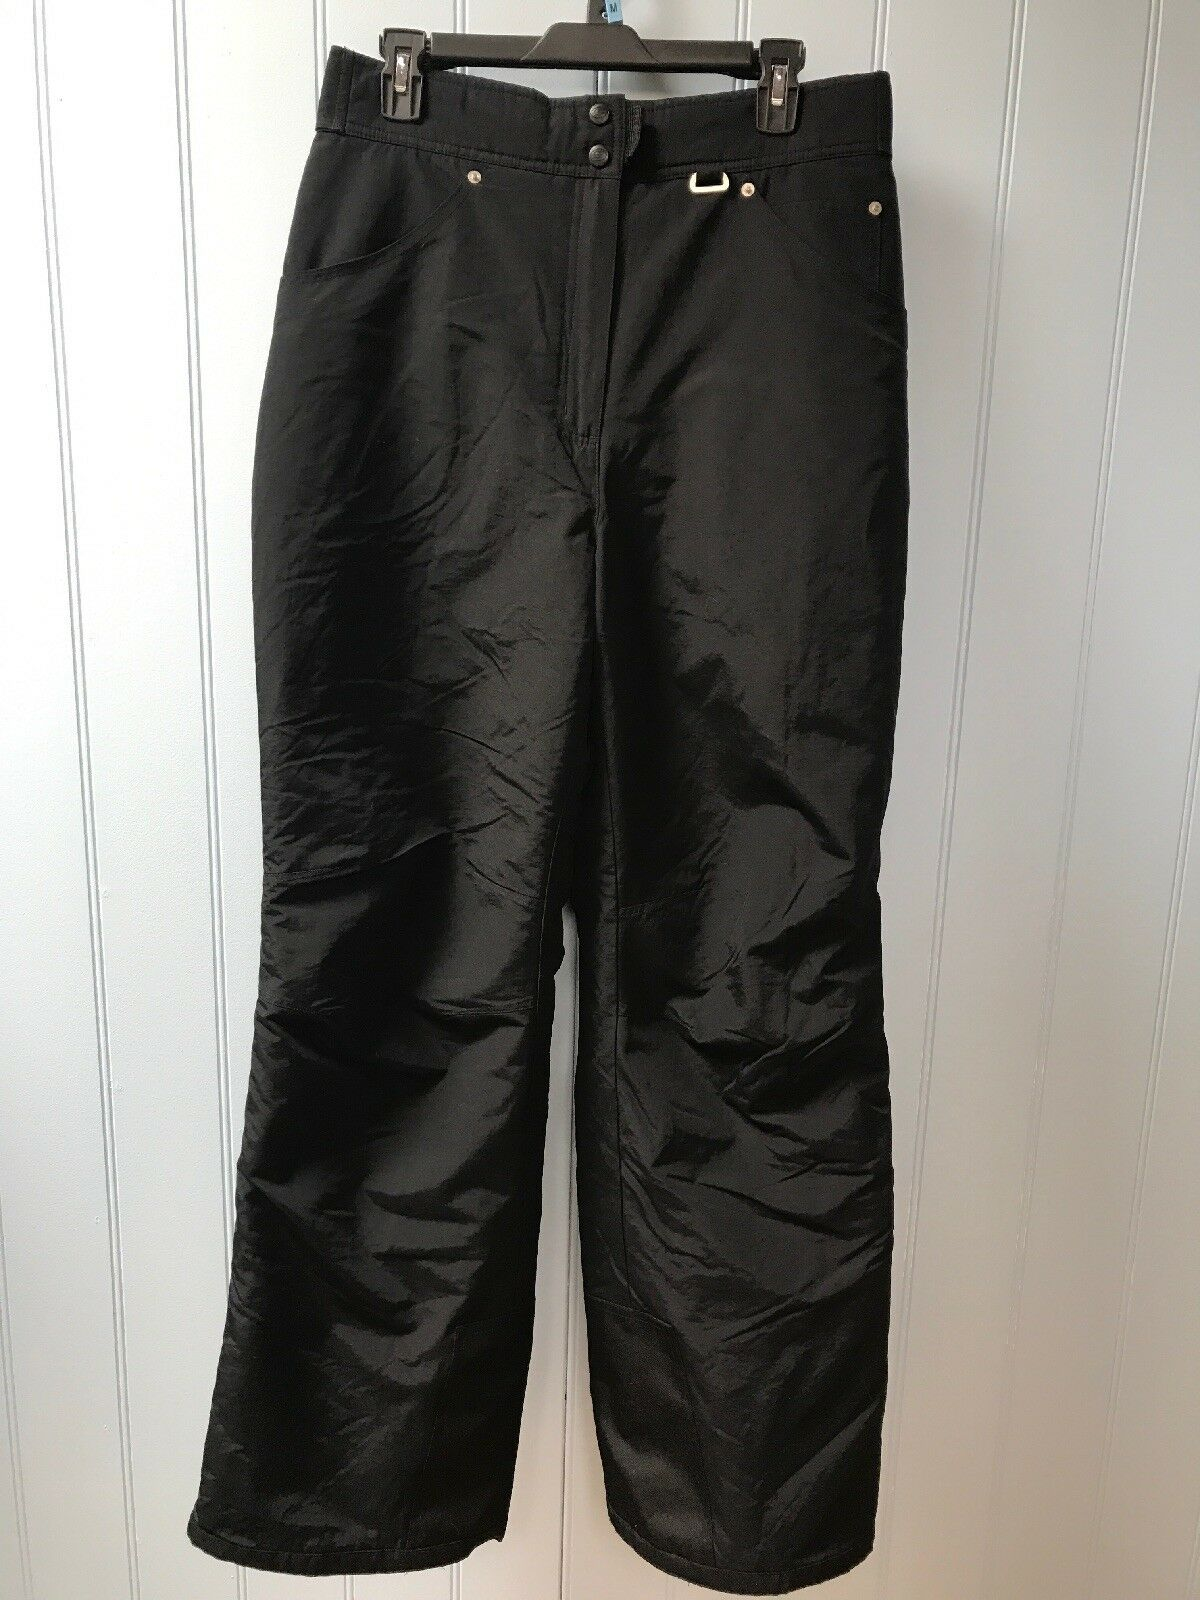 Slalom Velcro Adjustable Waist Men's Nylon Winter Ski Snowboard Pants Size L